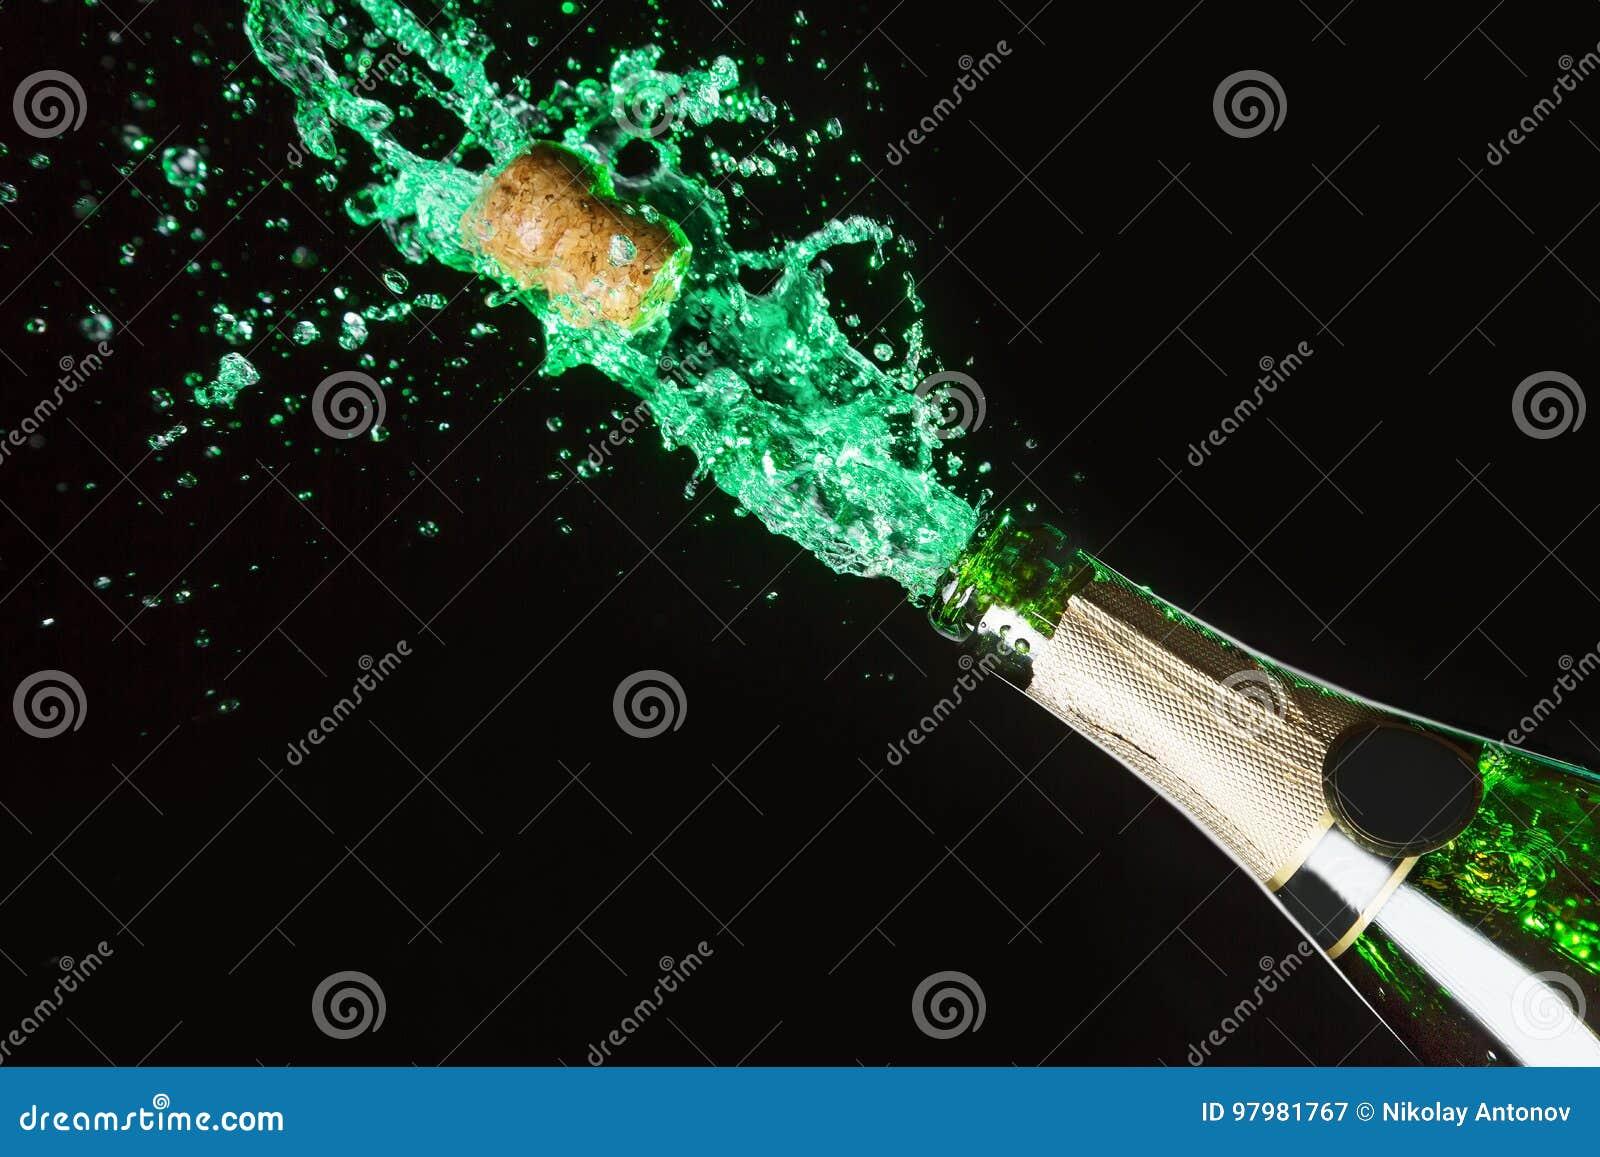 Celebration alcohol theme with explosion of splashing green absinth on black background.